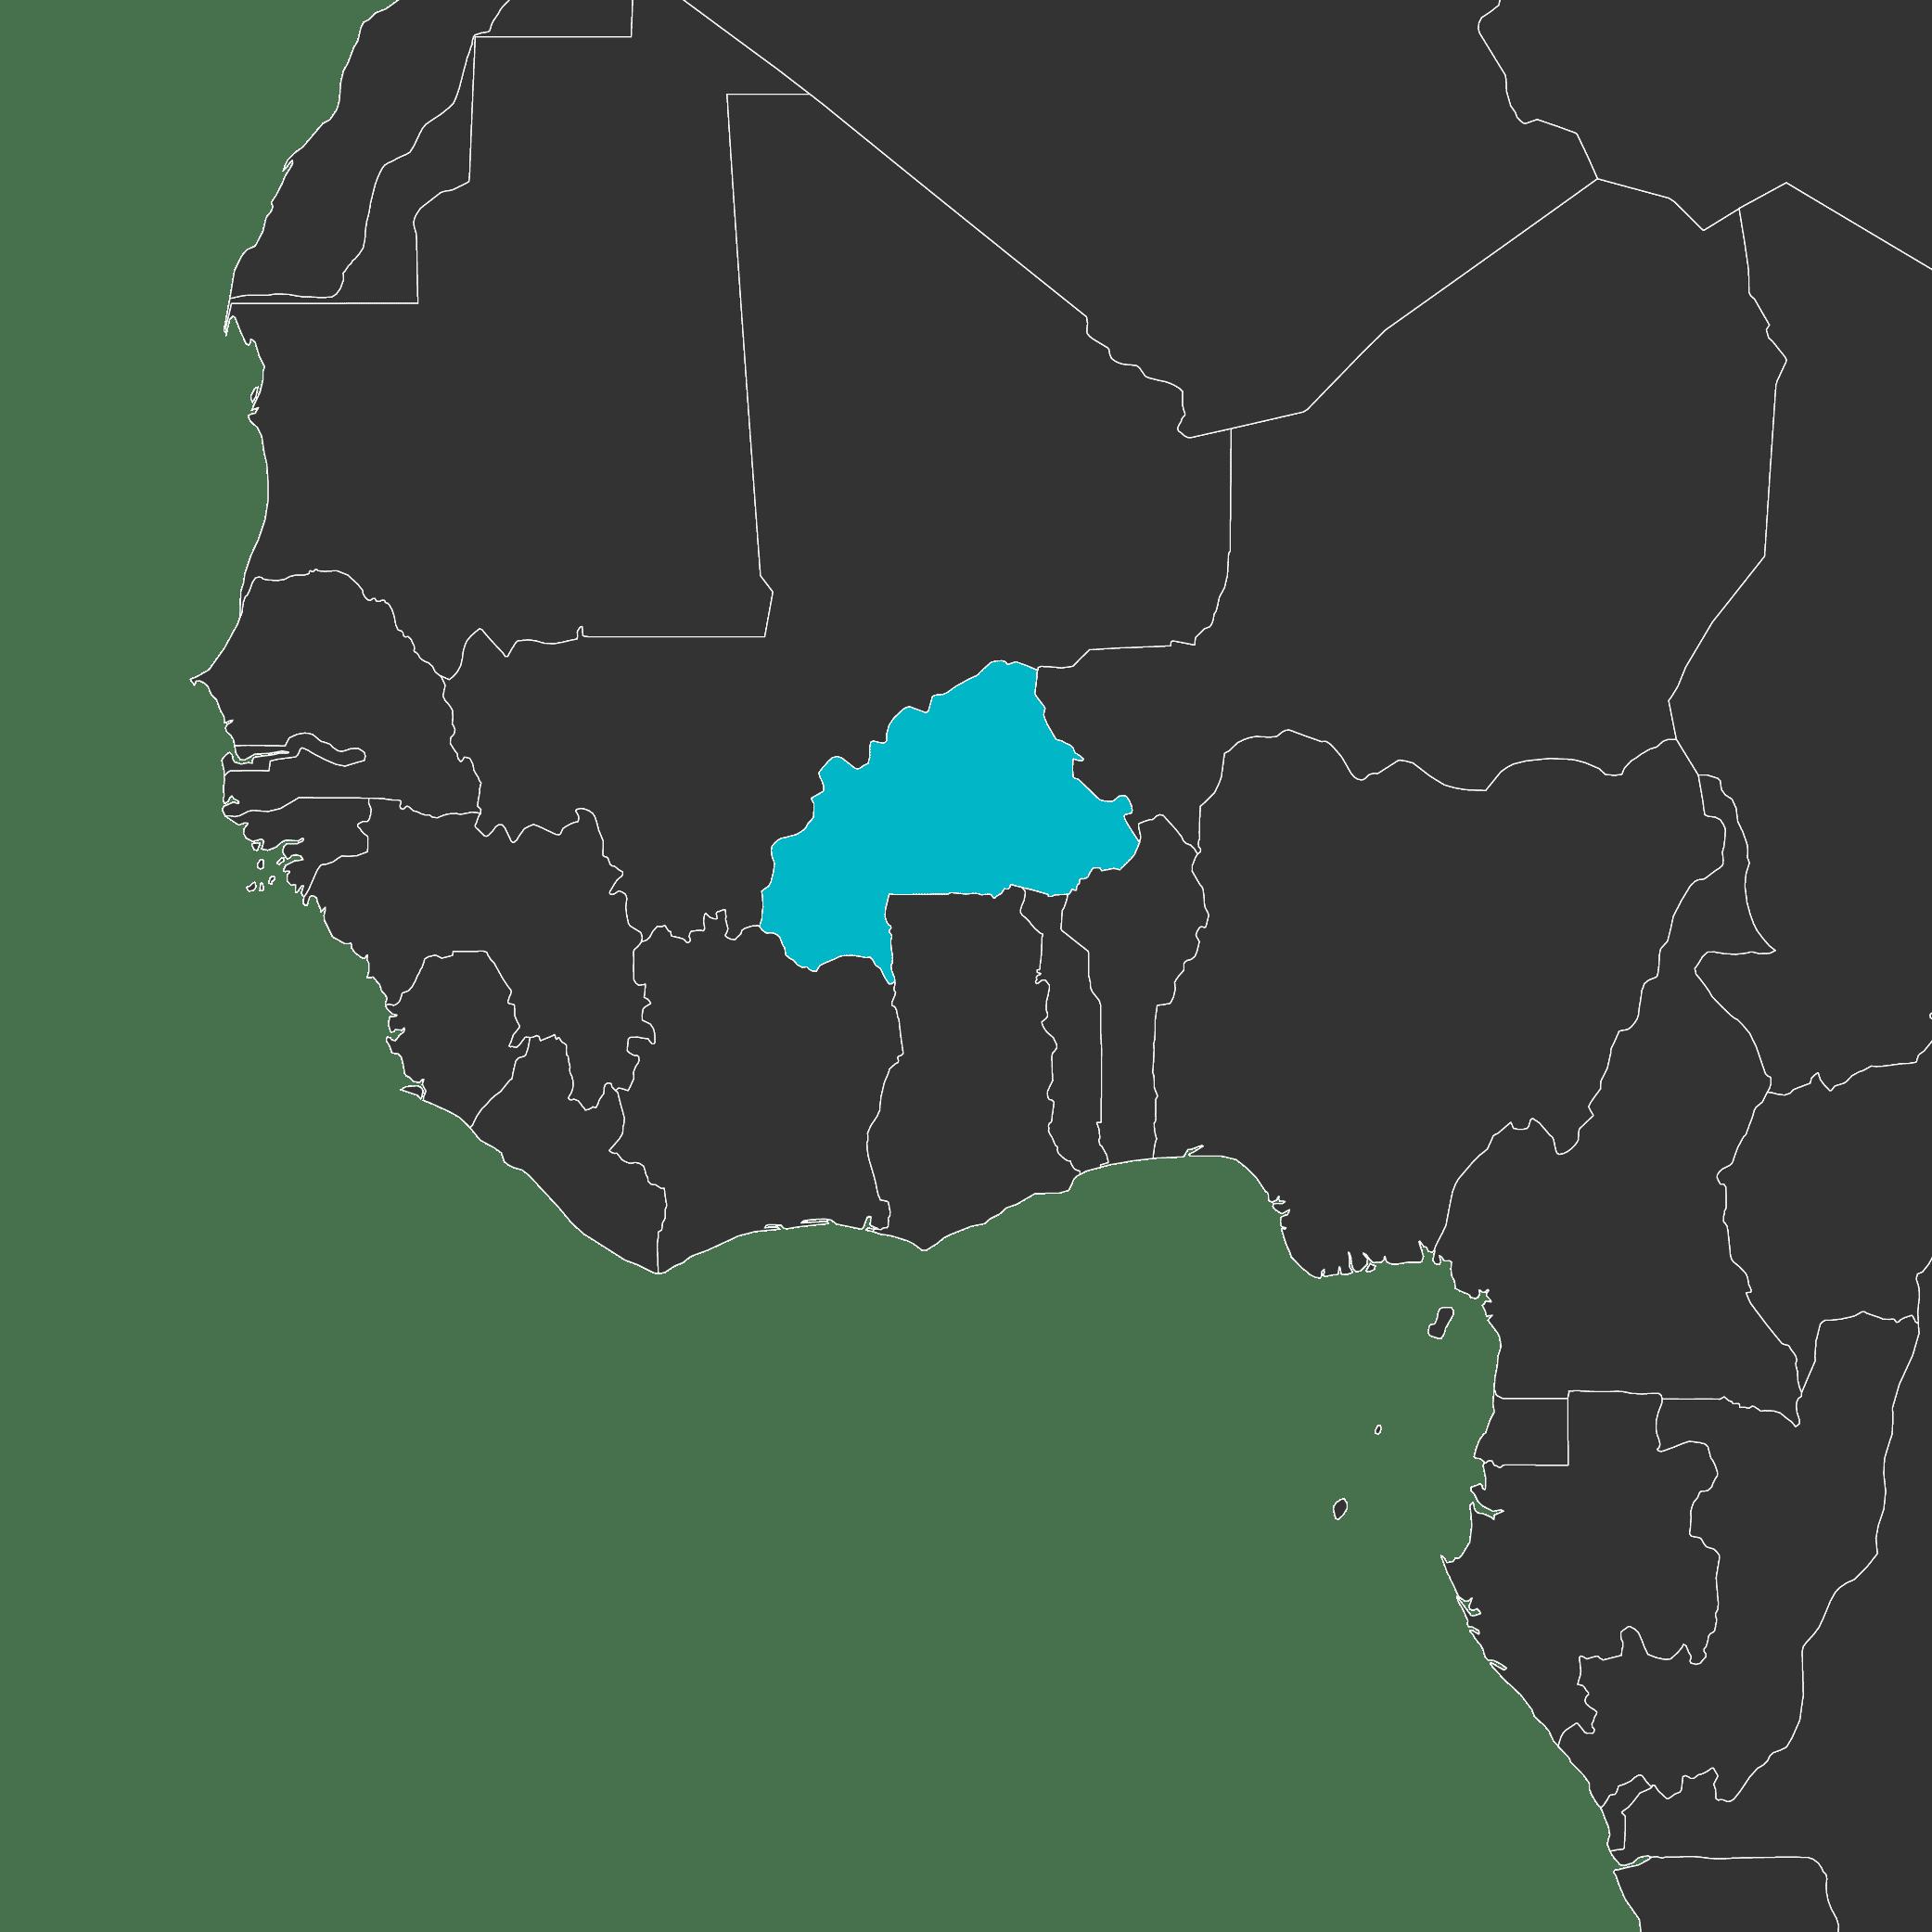 BURKINA FASO: Hospital, construction management by jocelyn kenmotsu, sponsored by som